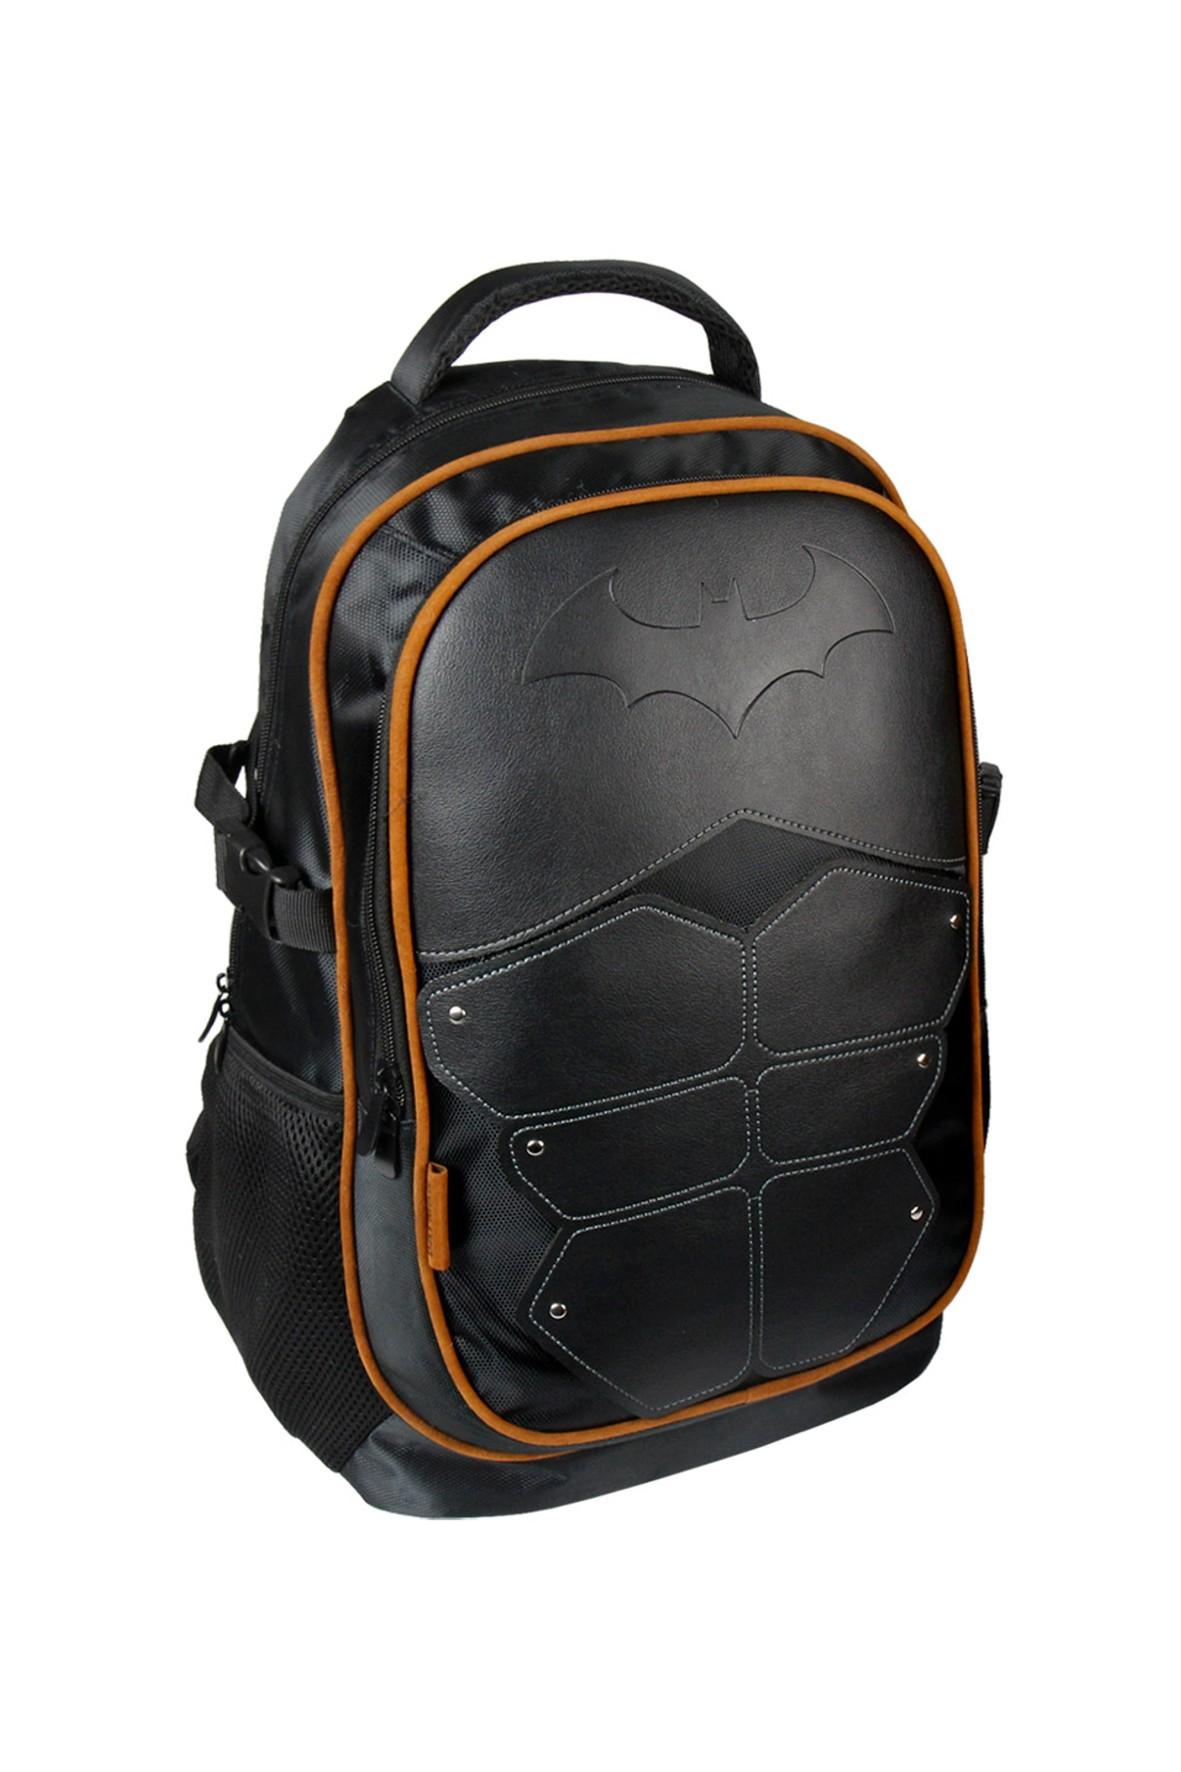 Plecak chłopięcy Batman